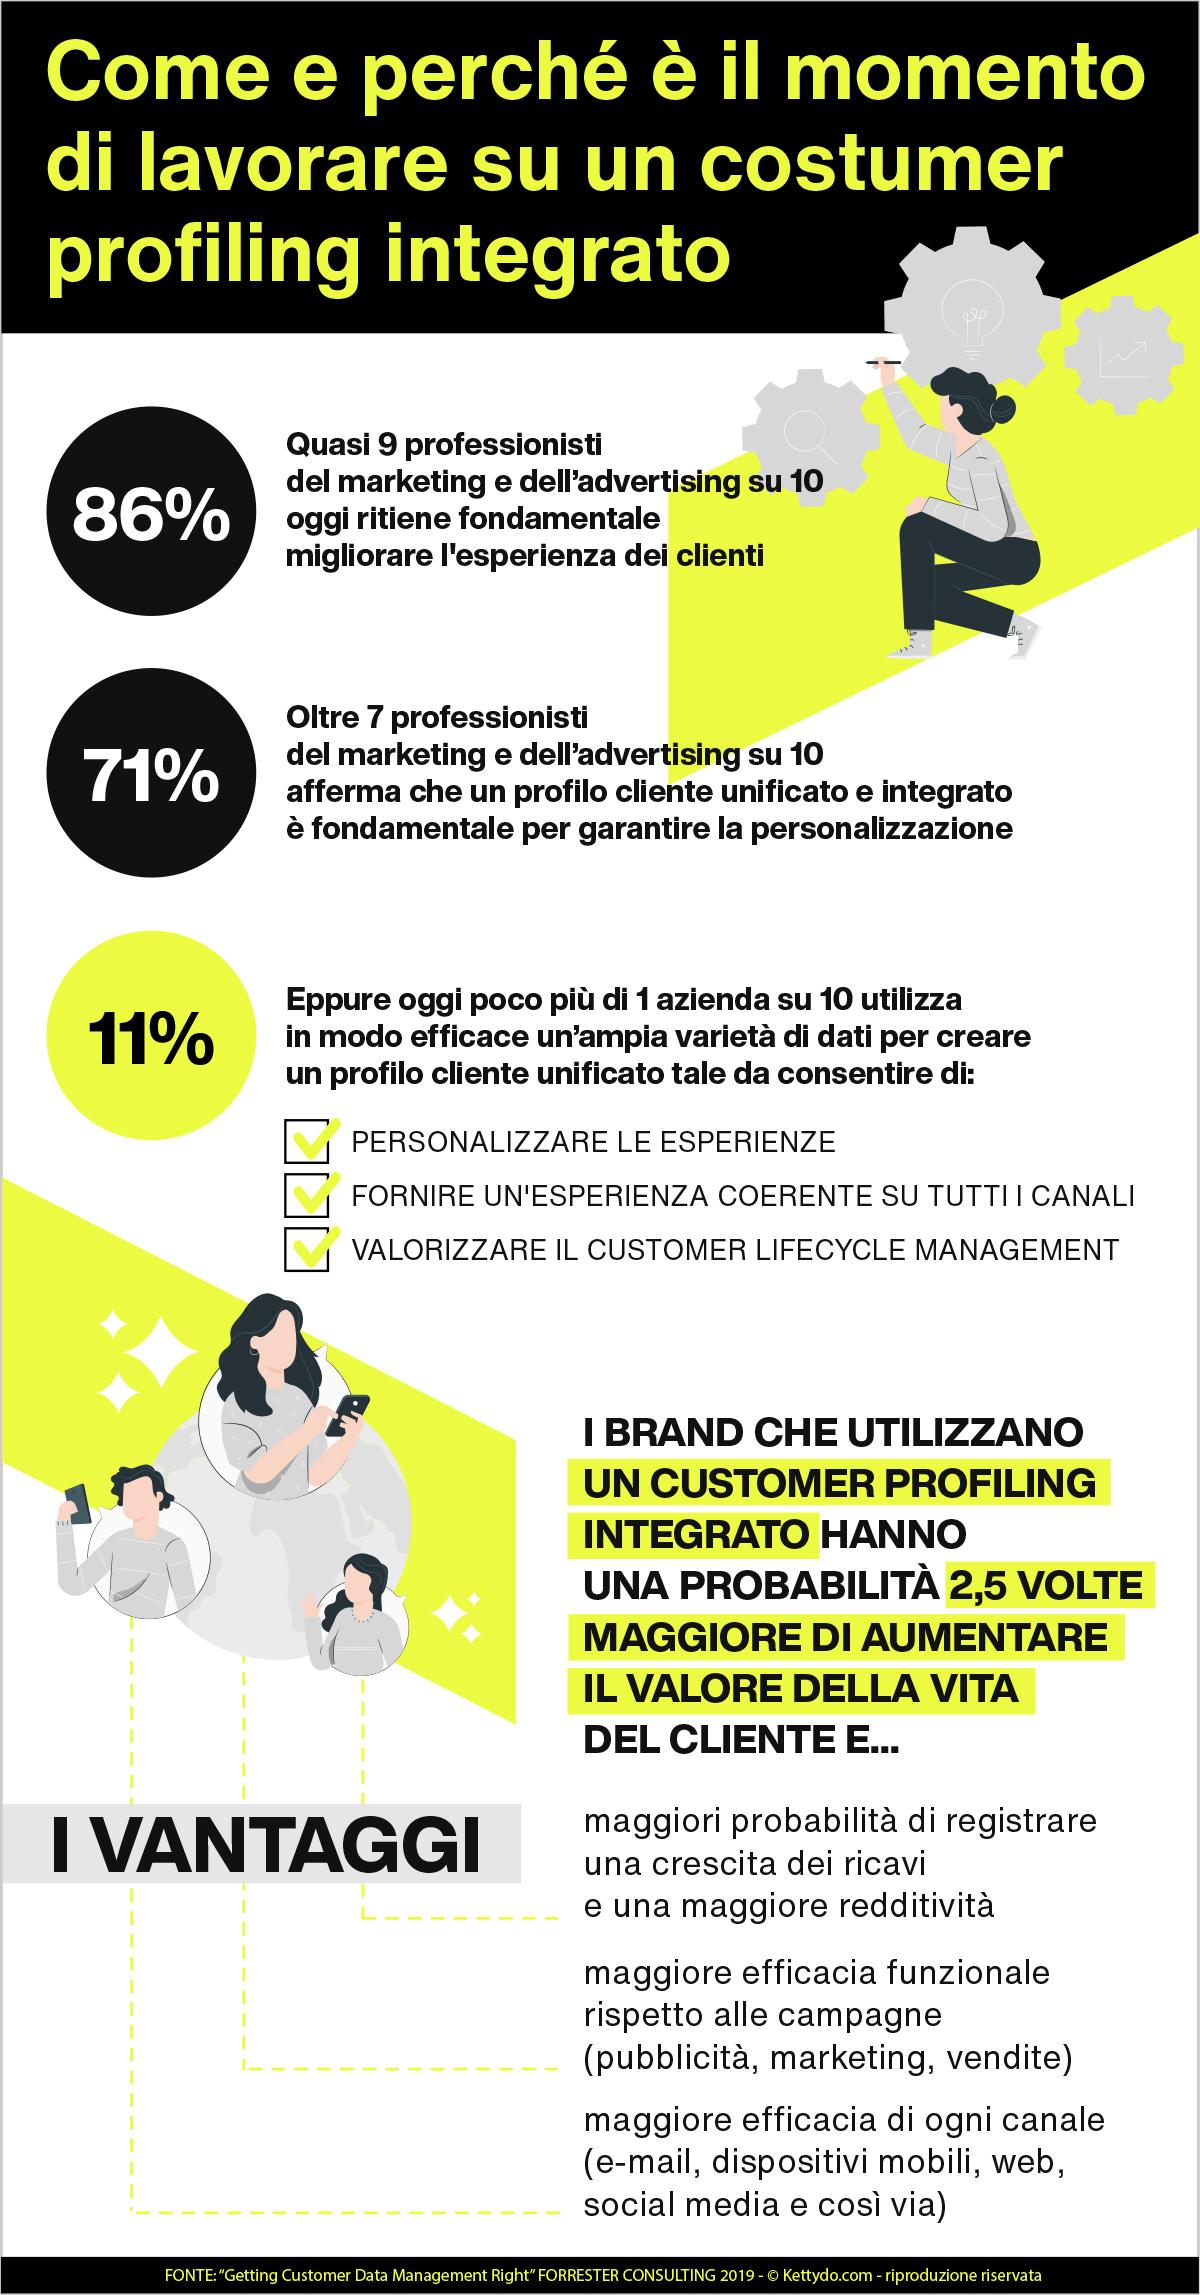 Customer profiling integrato infografica